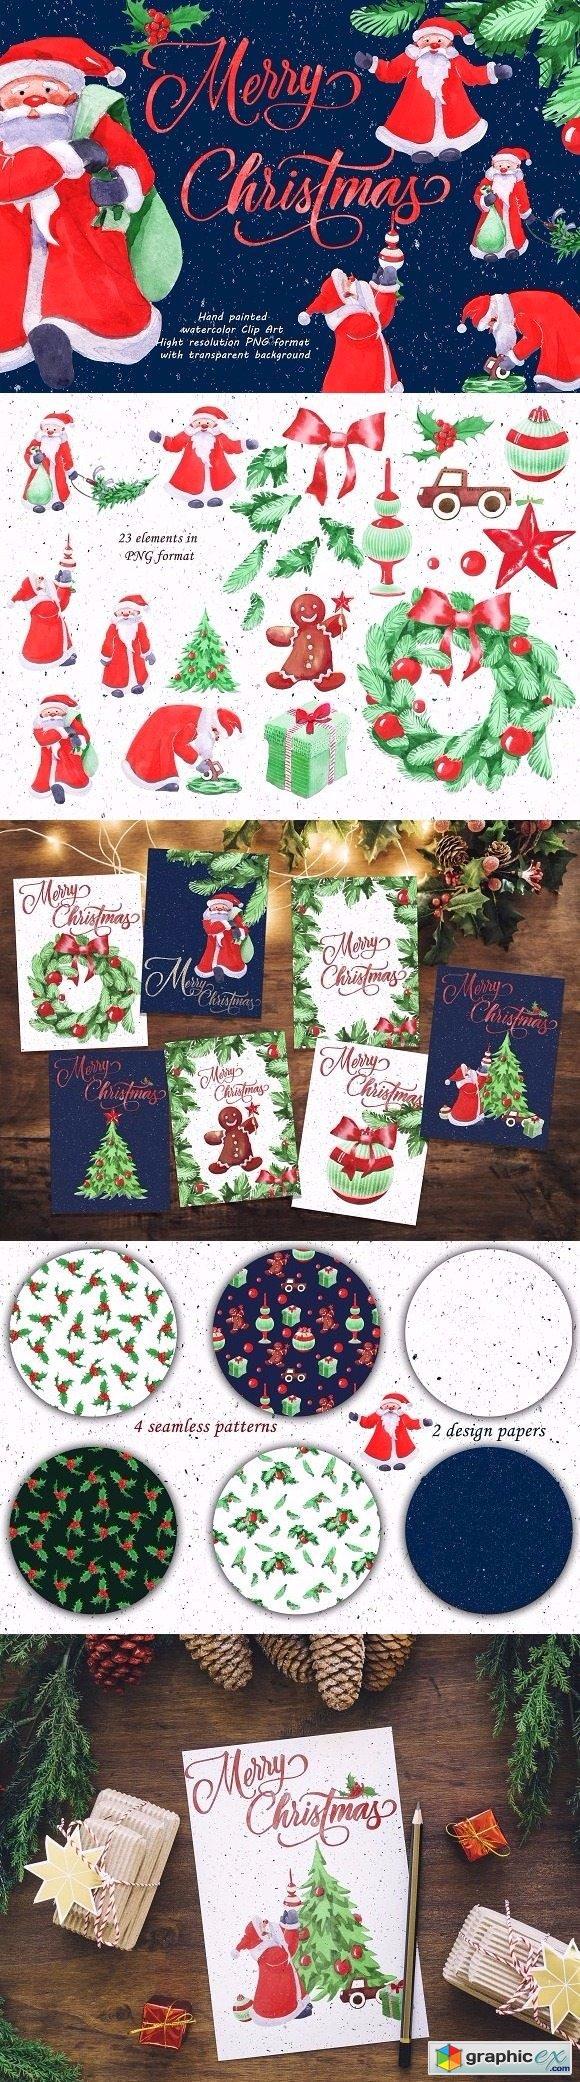 Merry Christmas 2081771